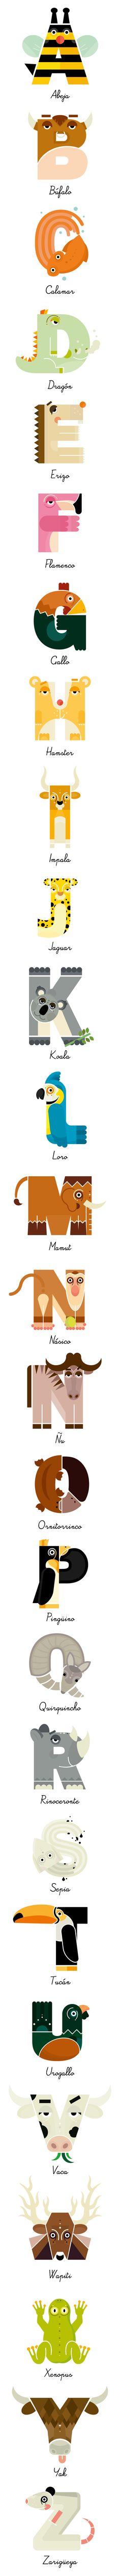 http://annatilchestudio.com/65612/1991482/projects/animal-alphabet-